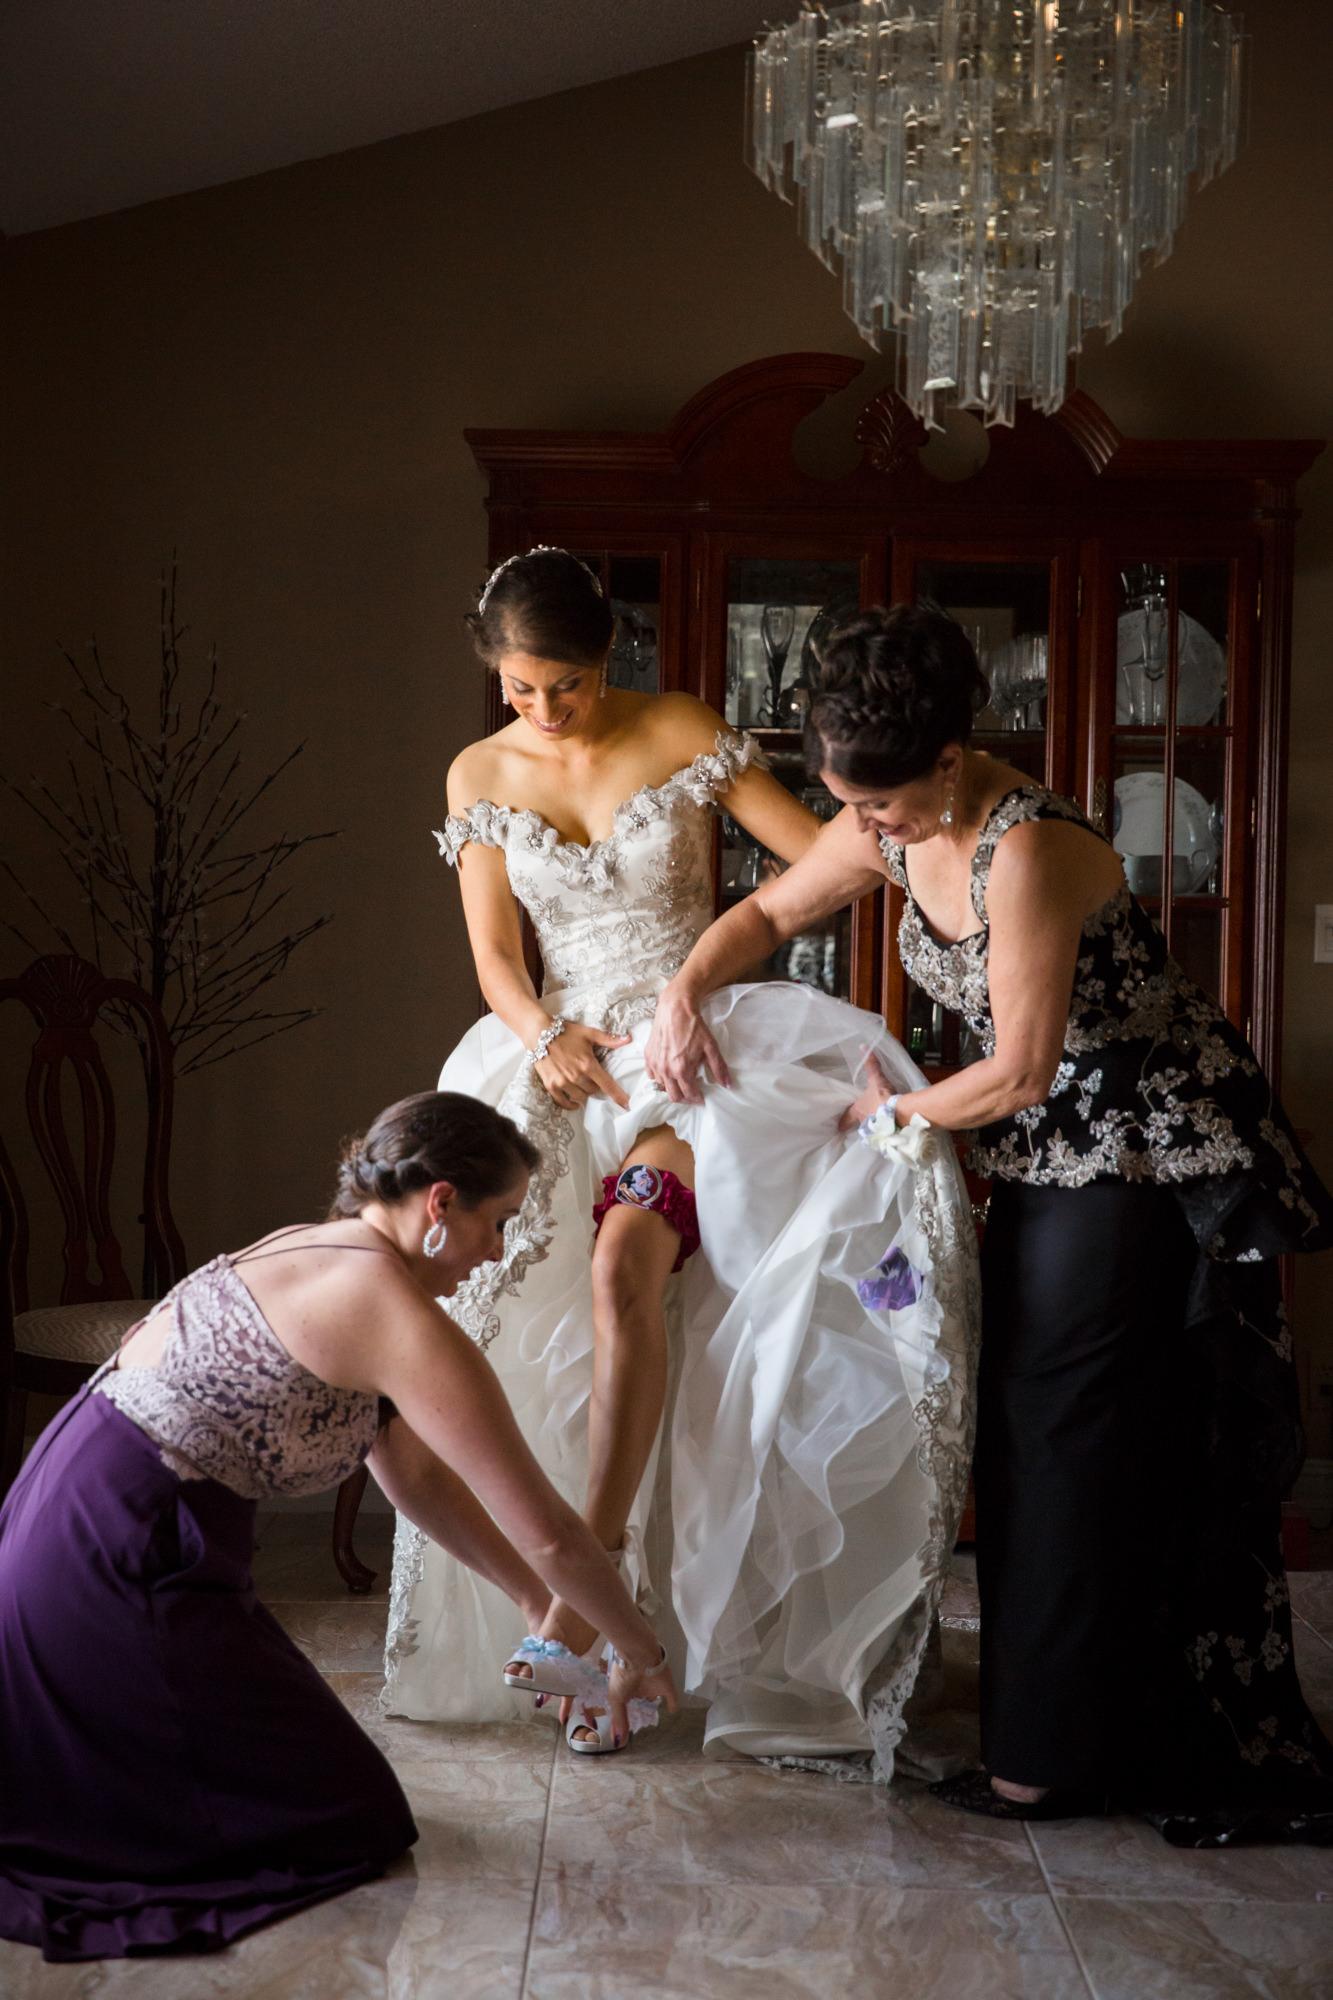 Benvenuto_Wedding_catholic_Florida_Bride-Groom-22.jpg